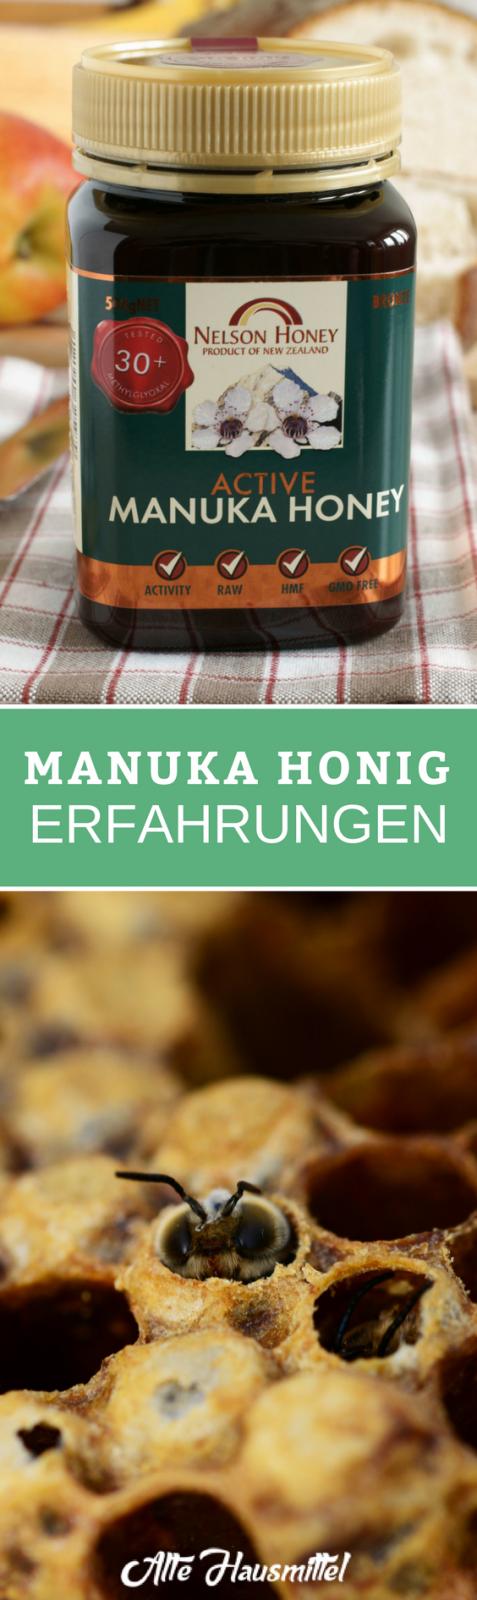 Manuka Honig Erfahrungen